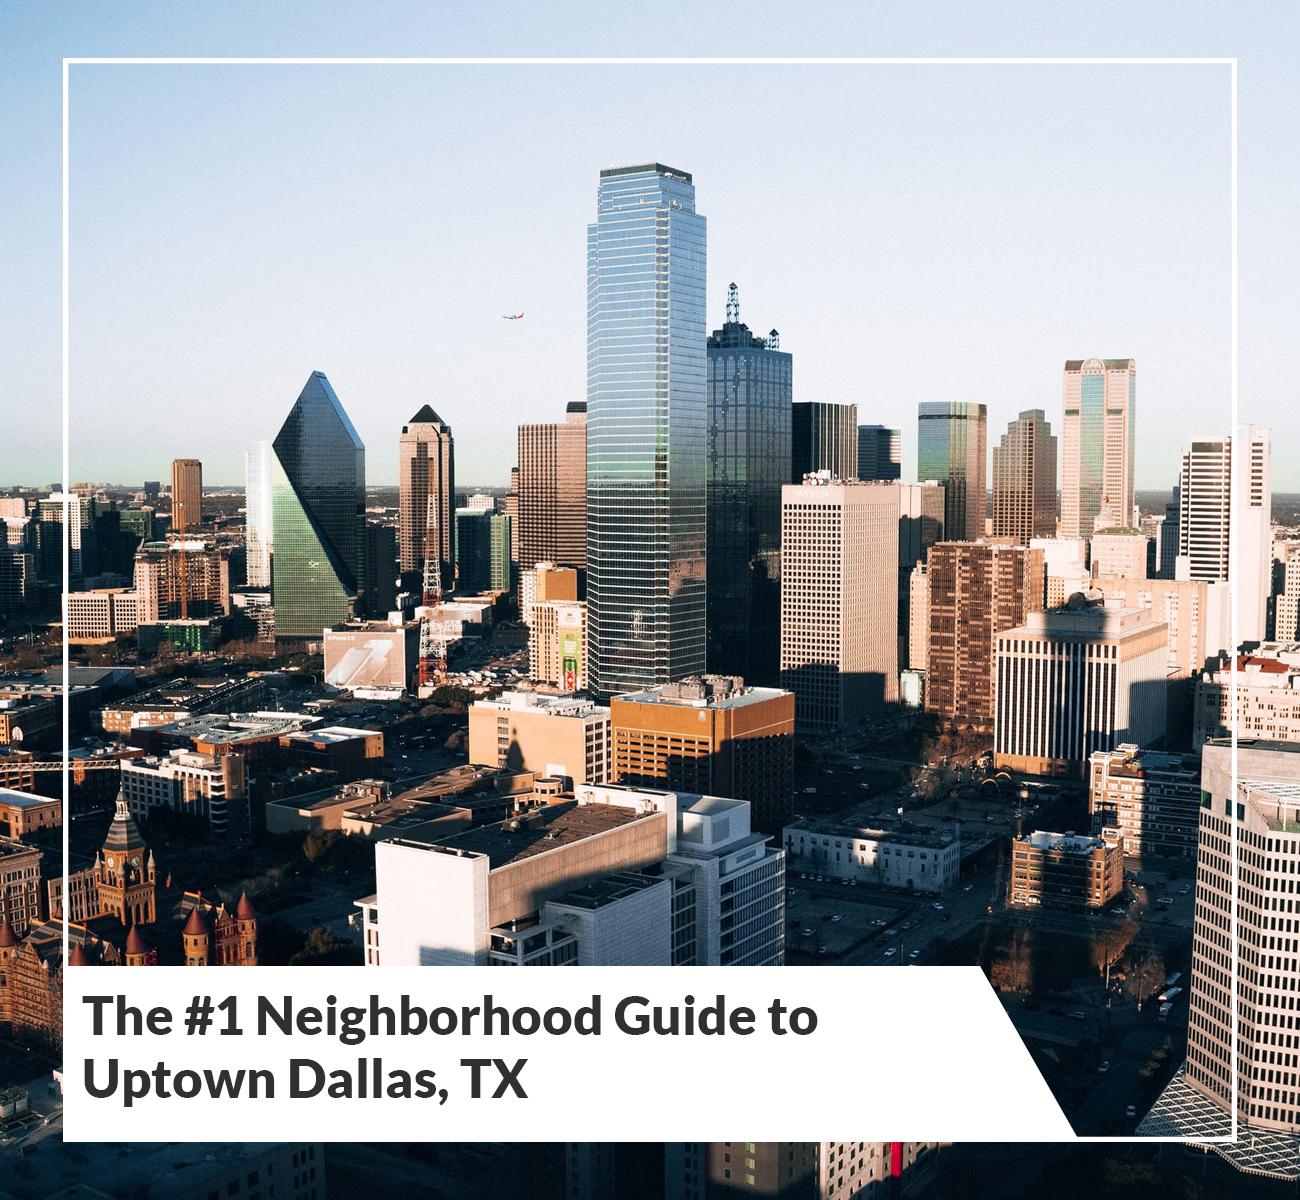 Neighborhood Guide to Uptown Dallas